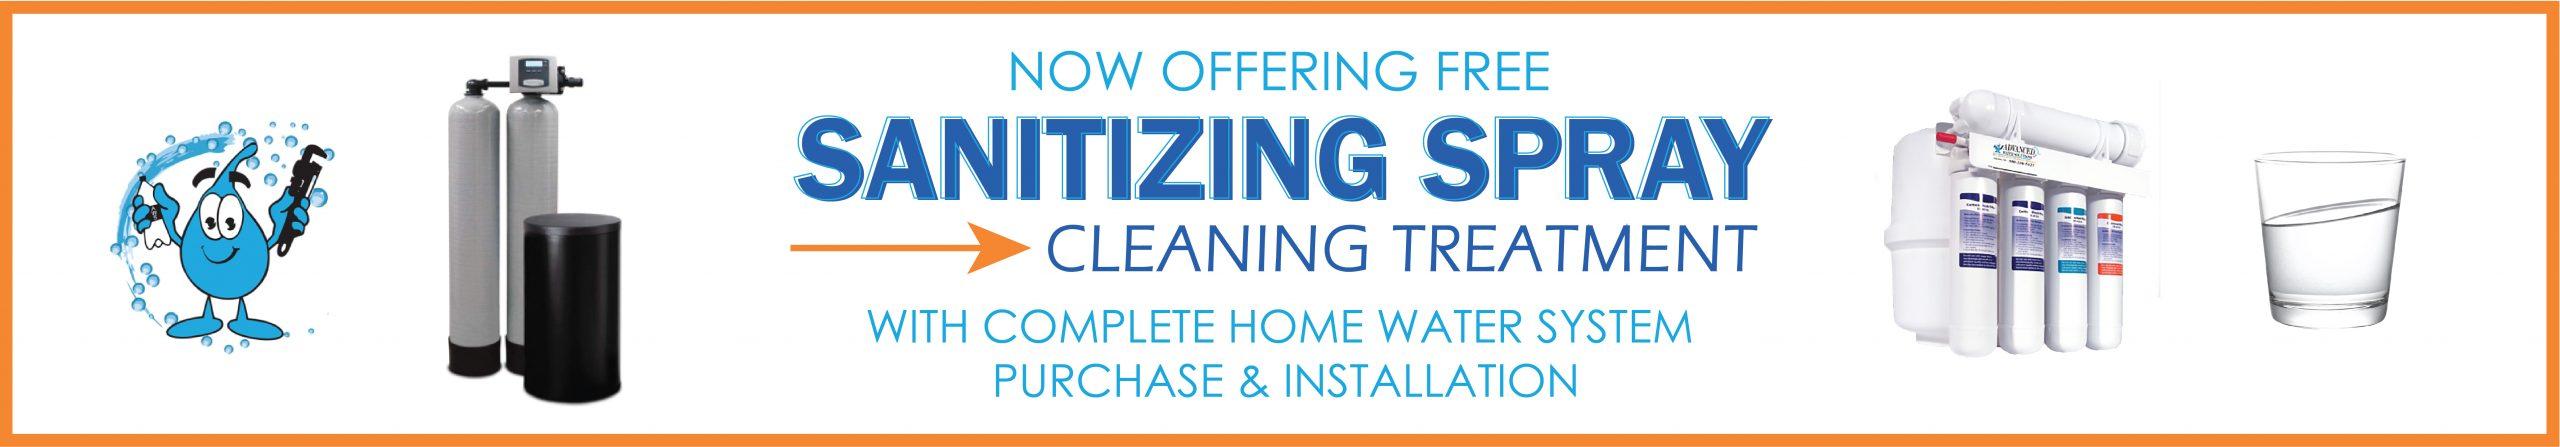 Sanitizing Spray Cleaning Treatment